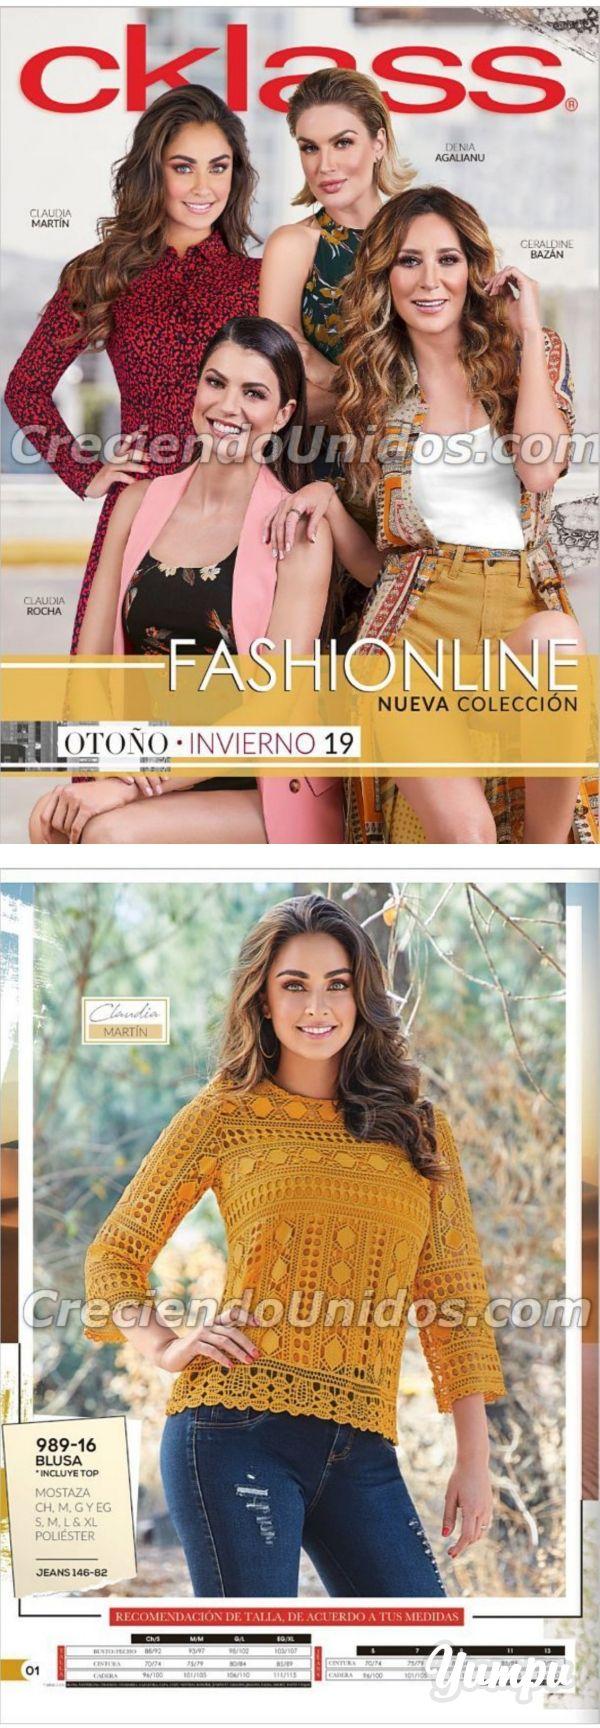 686 Cklass Fashionline 2019 Precios De Mayoreo En Usa Magazine With 292 Pages 686 Cklass Fashionline 2019 P Catalogos De Ropa Cklass Ropa Catalogos Cklass